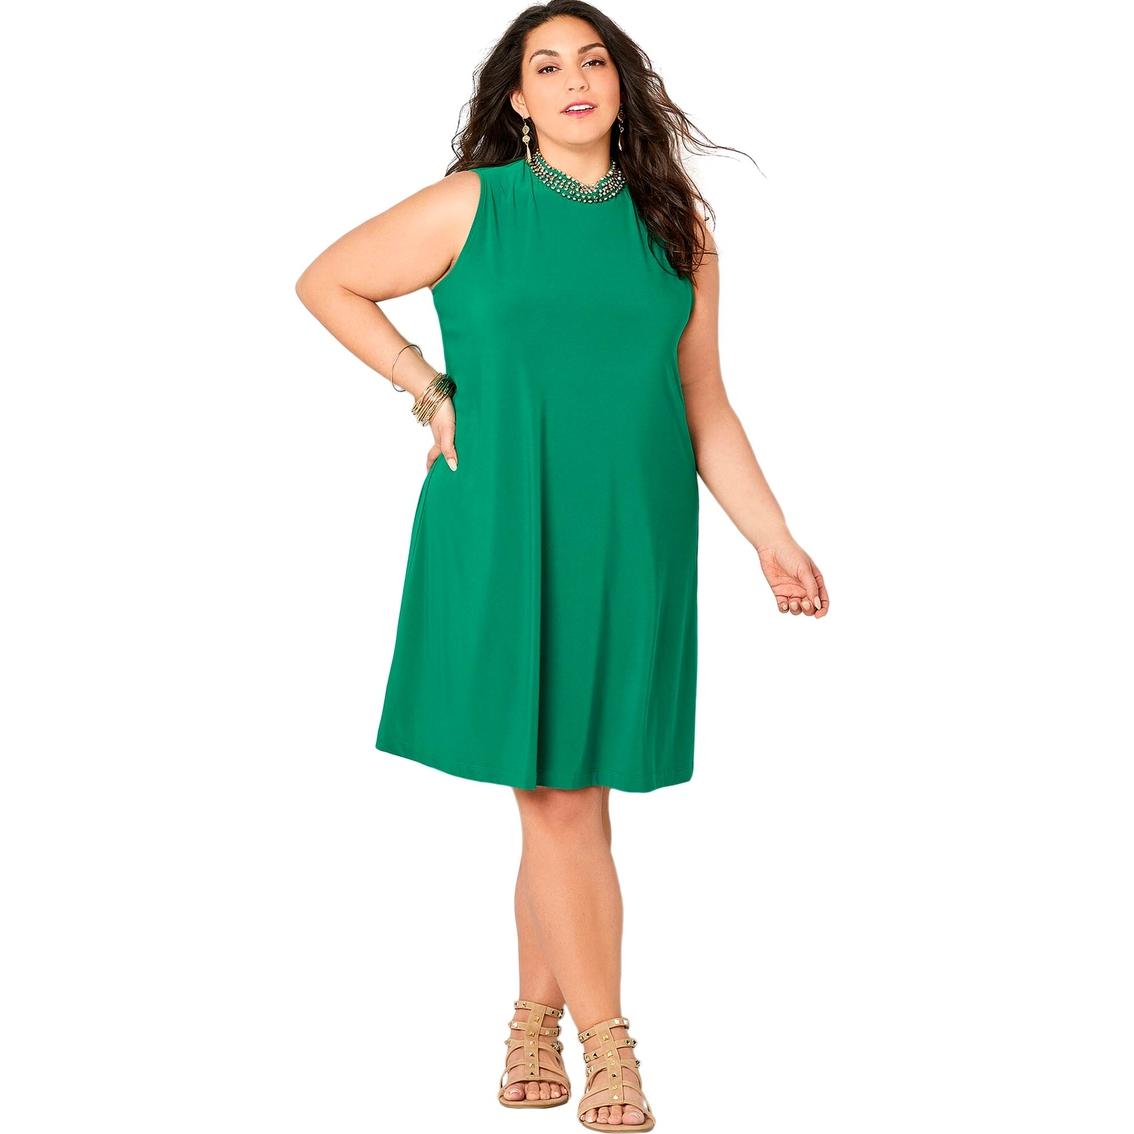 Avenue Plus Size Beaded Sheath Dress | Dresses | Apparel ...